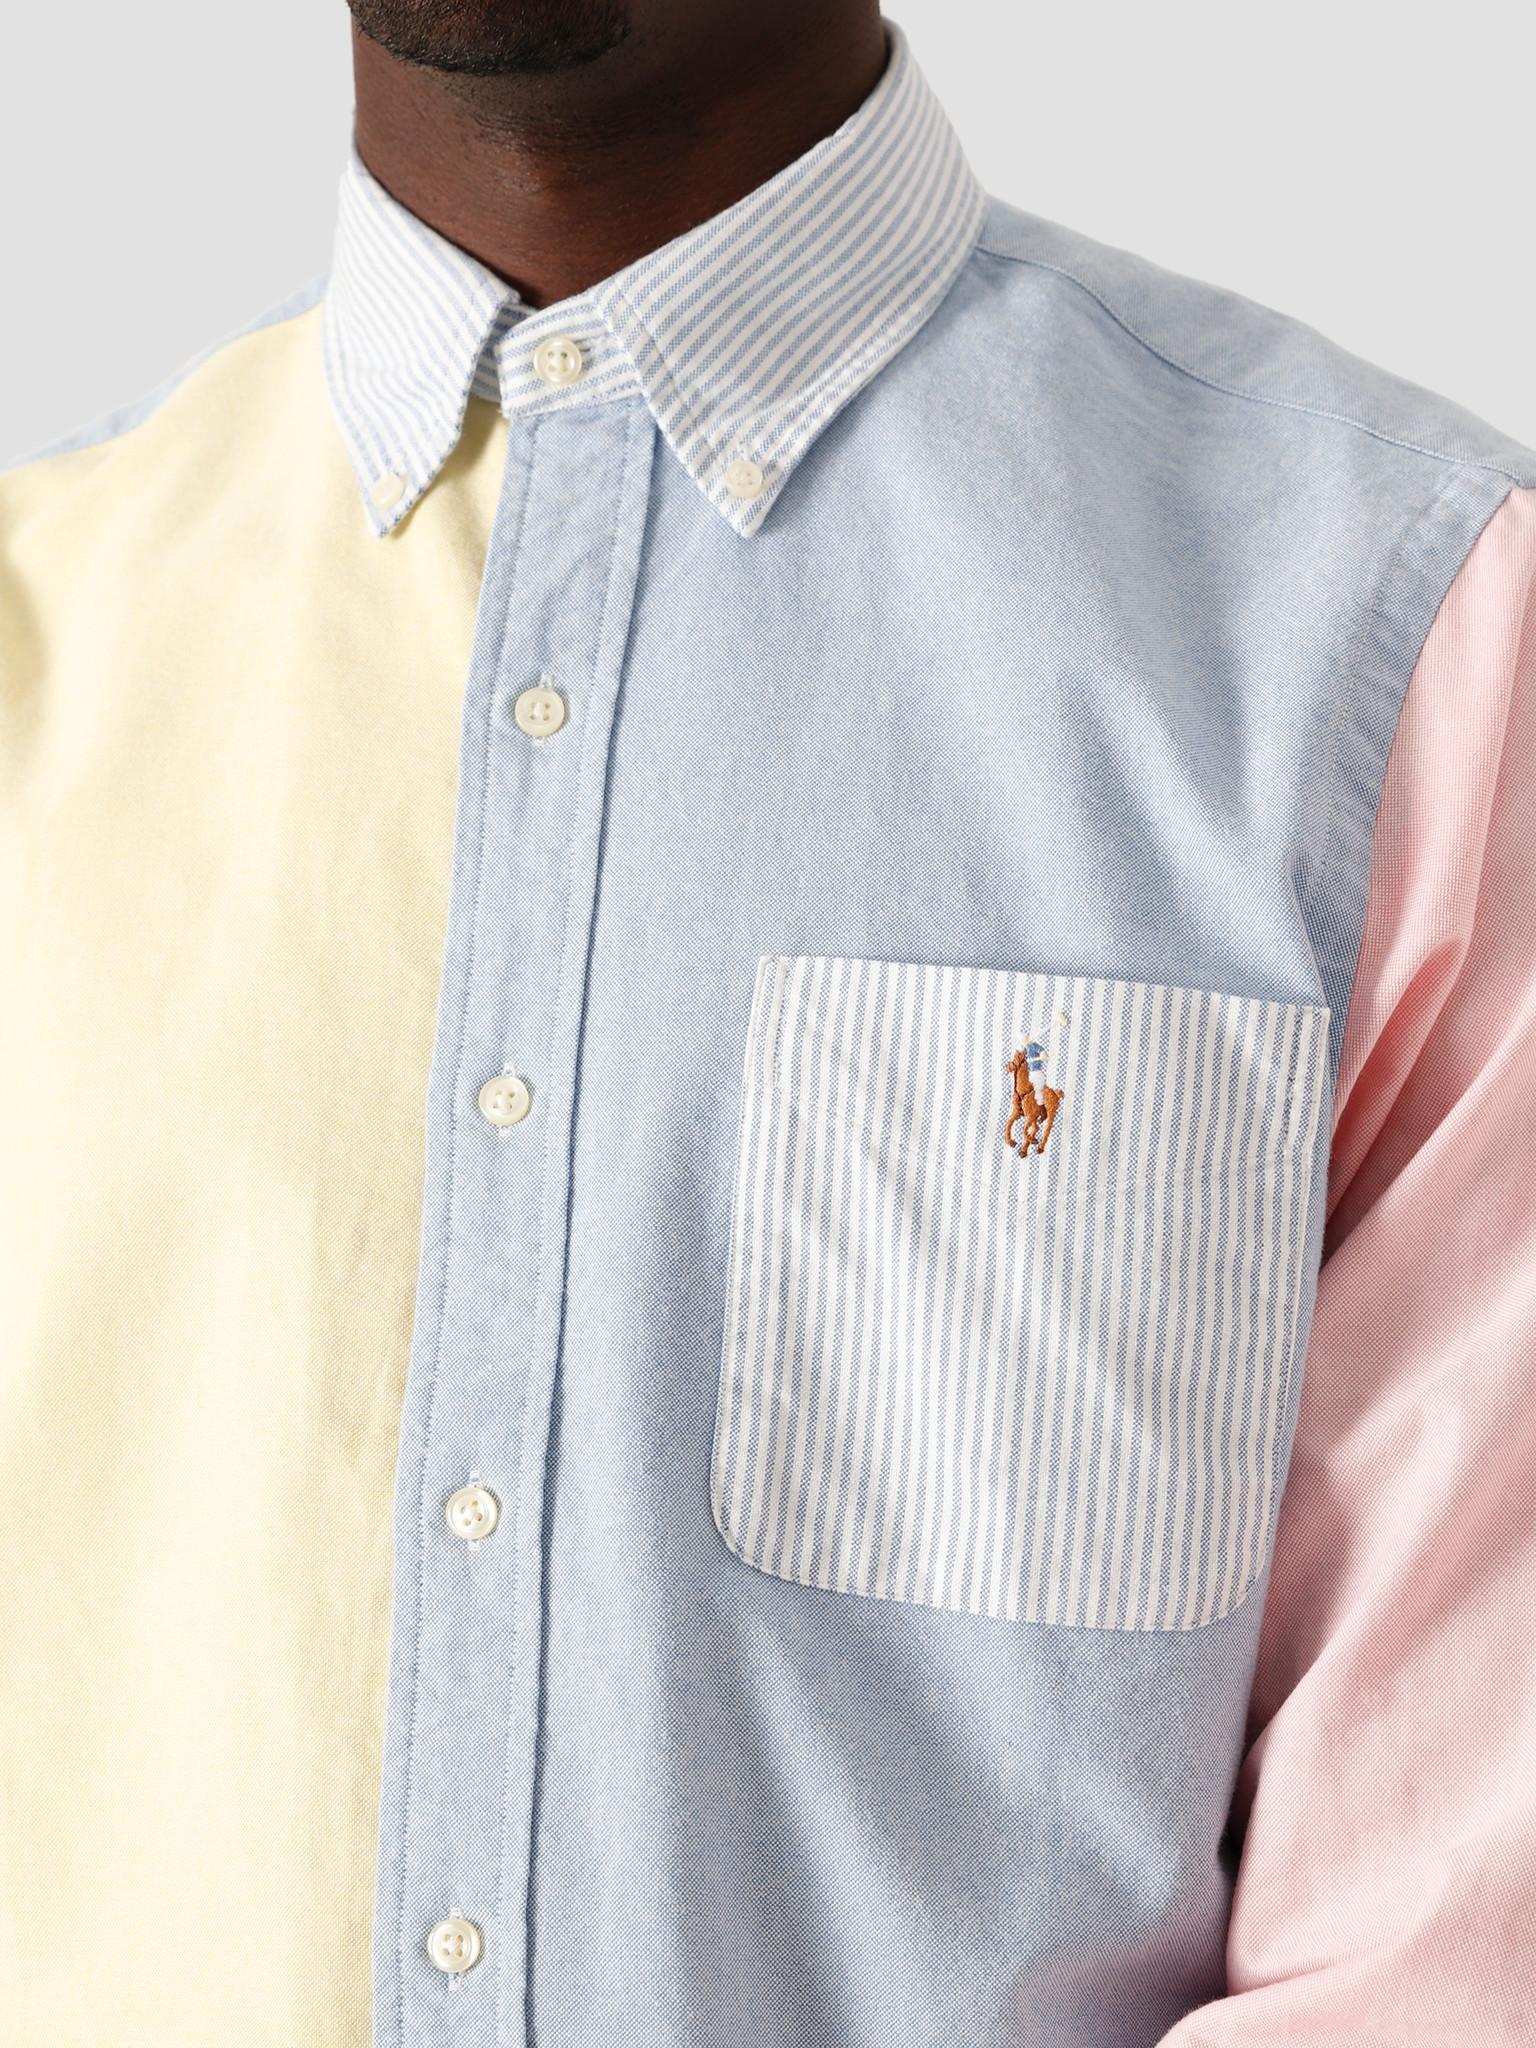 Polo Ralph Lauren Polo Ralph Lauren Oxford Shirt 4680 Solid Fun 710786711001